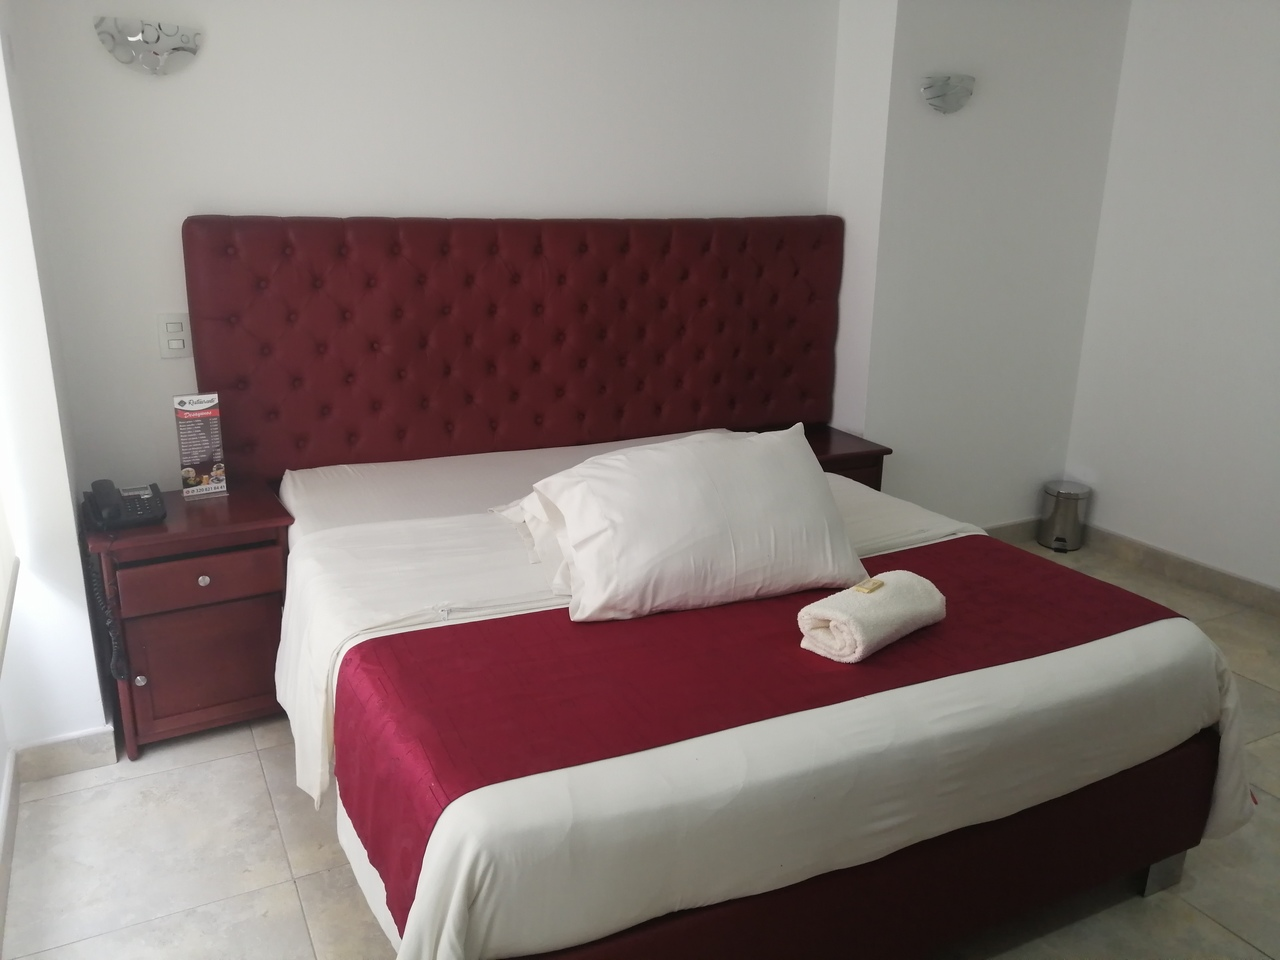 Hotel Cabrera Real en Teusaquillo : MotelNow